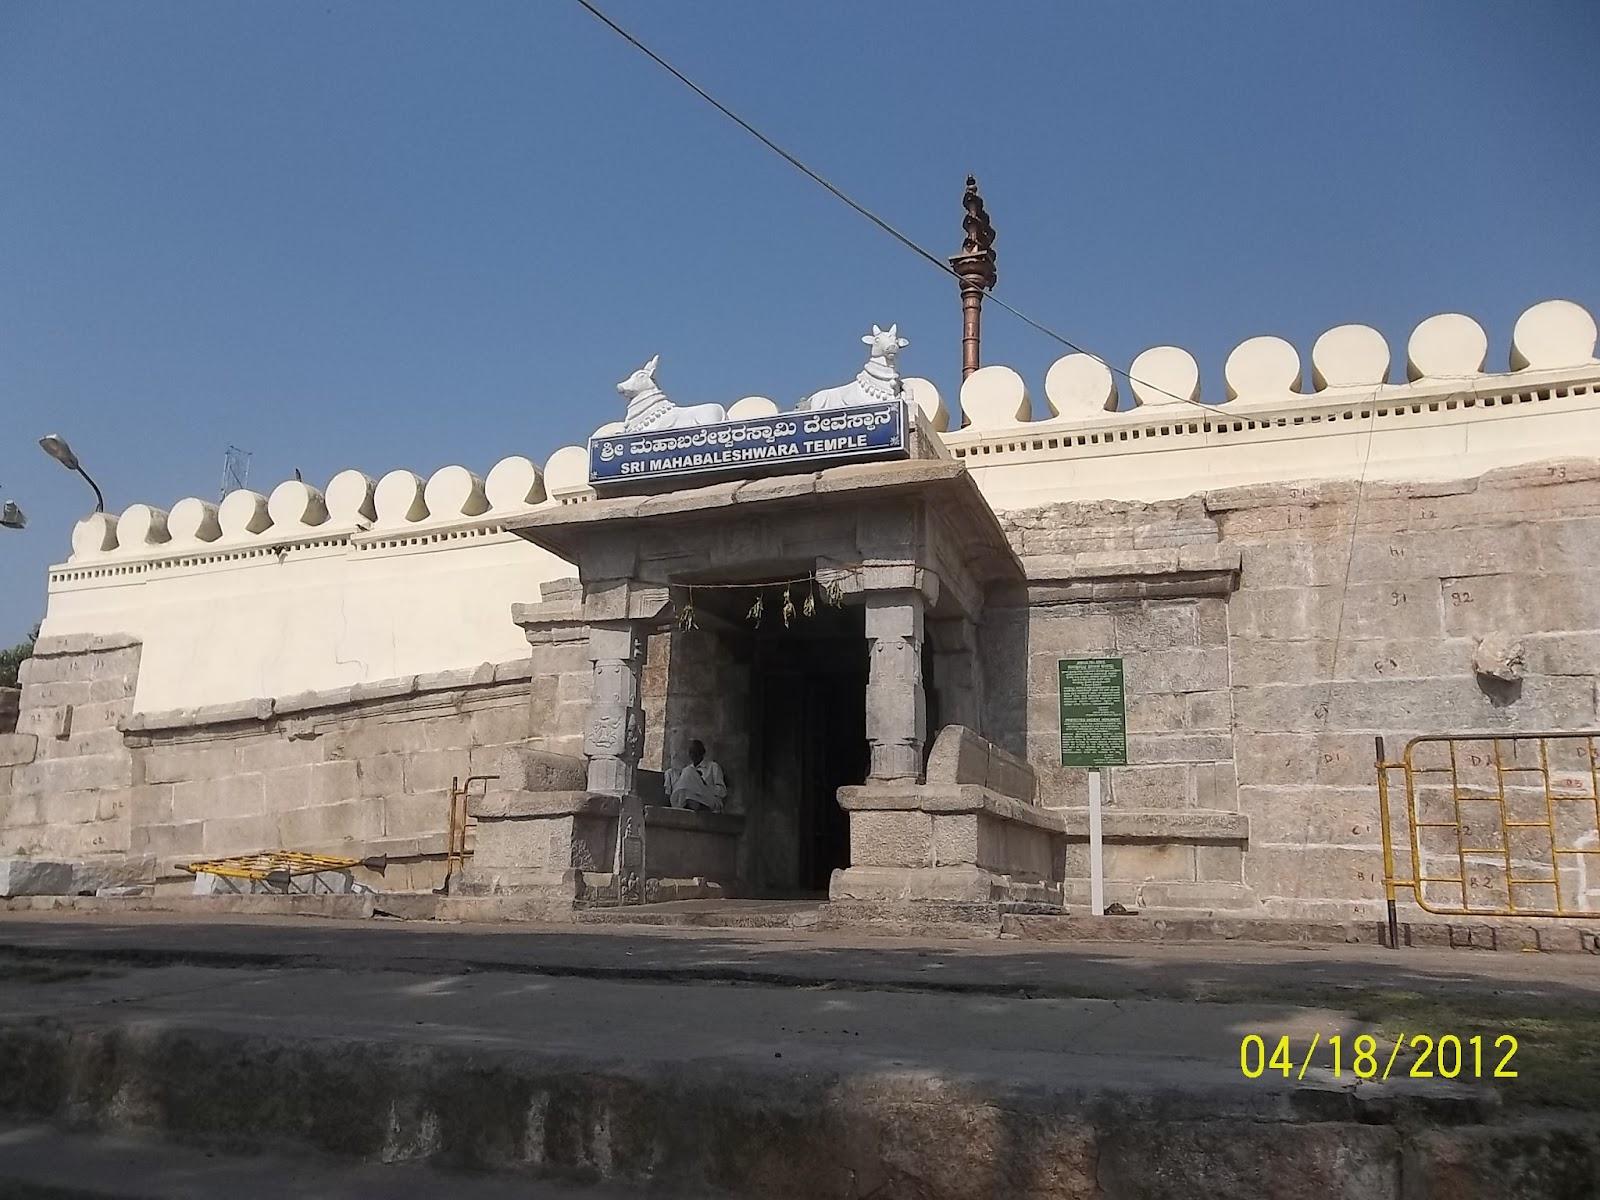 Mahabaleshwar Temple, Chamundi Hills, Mysore